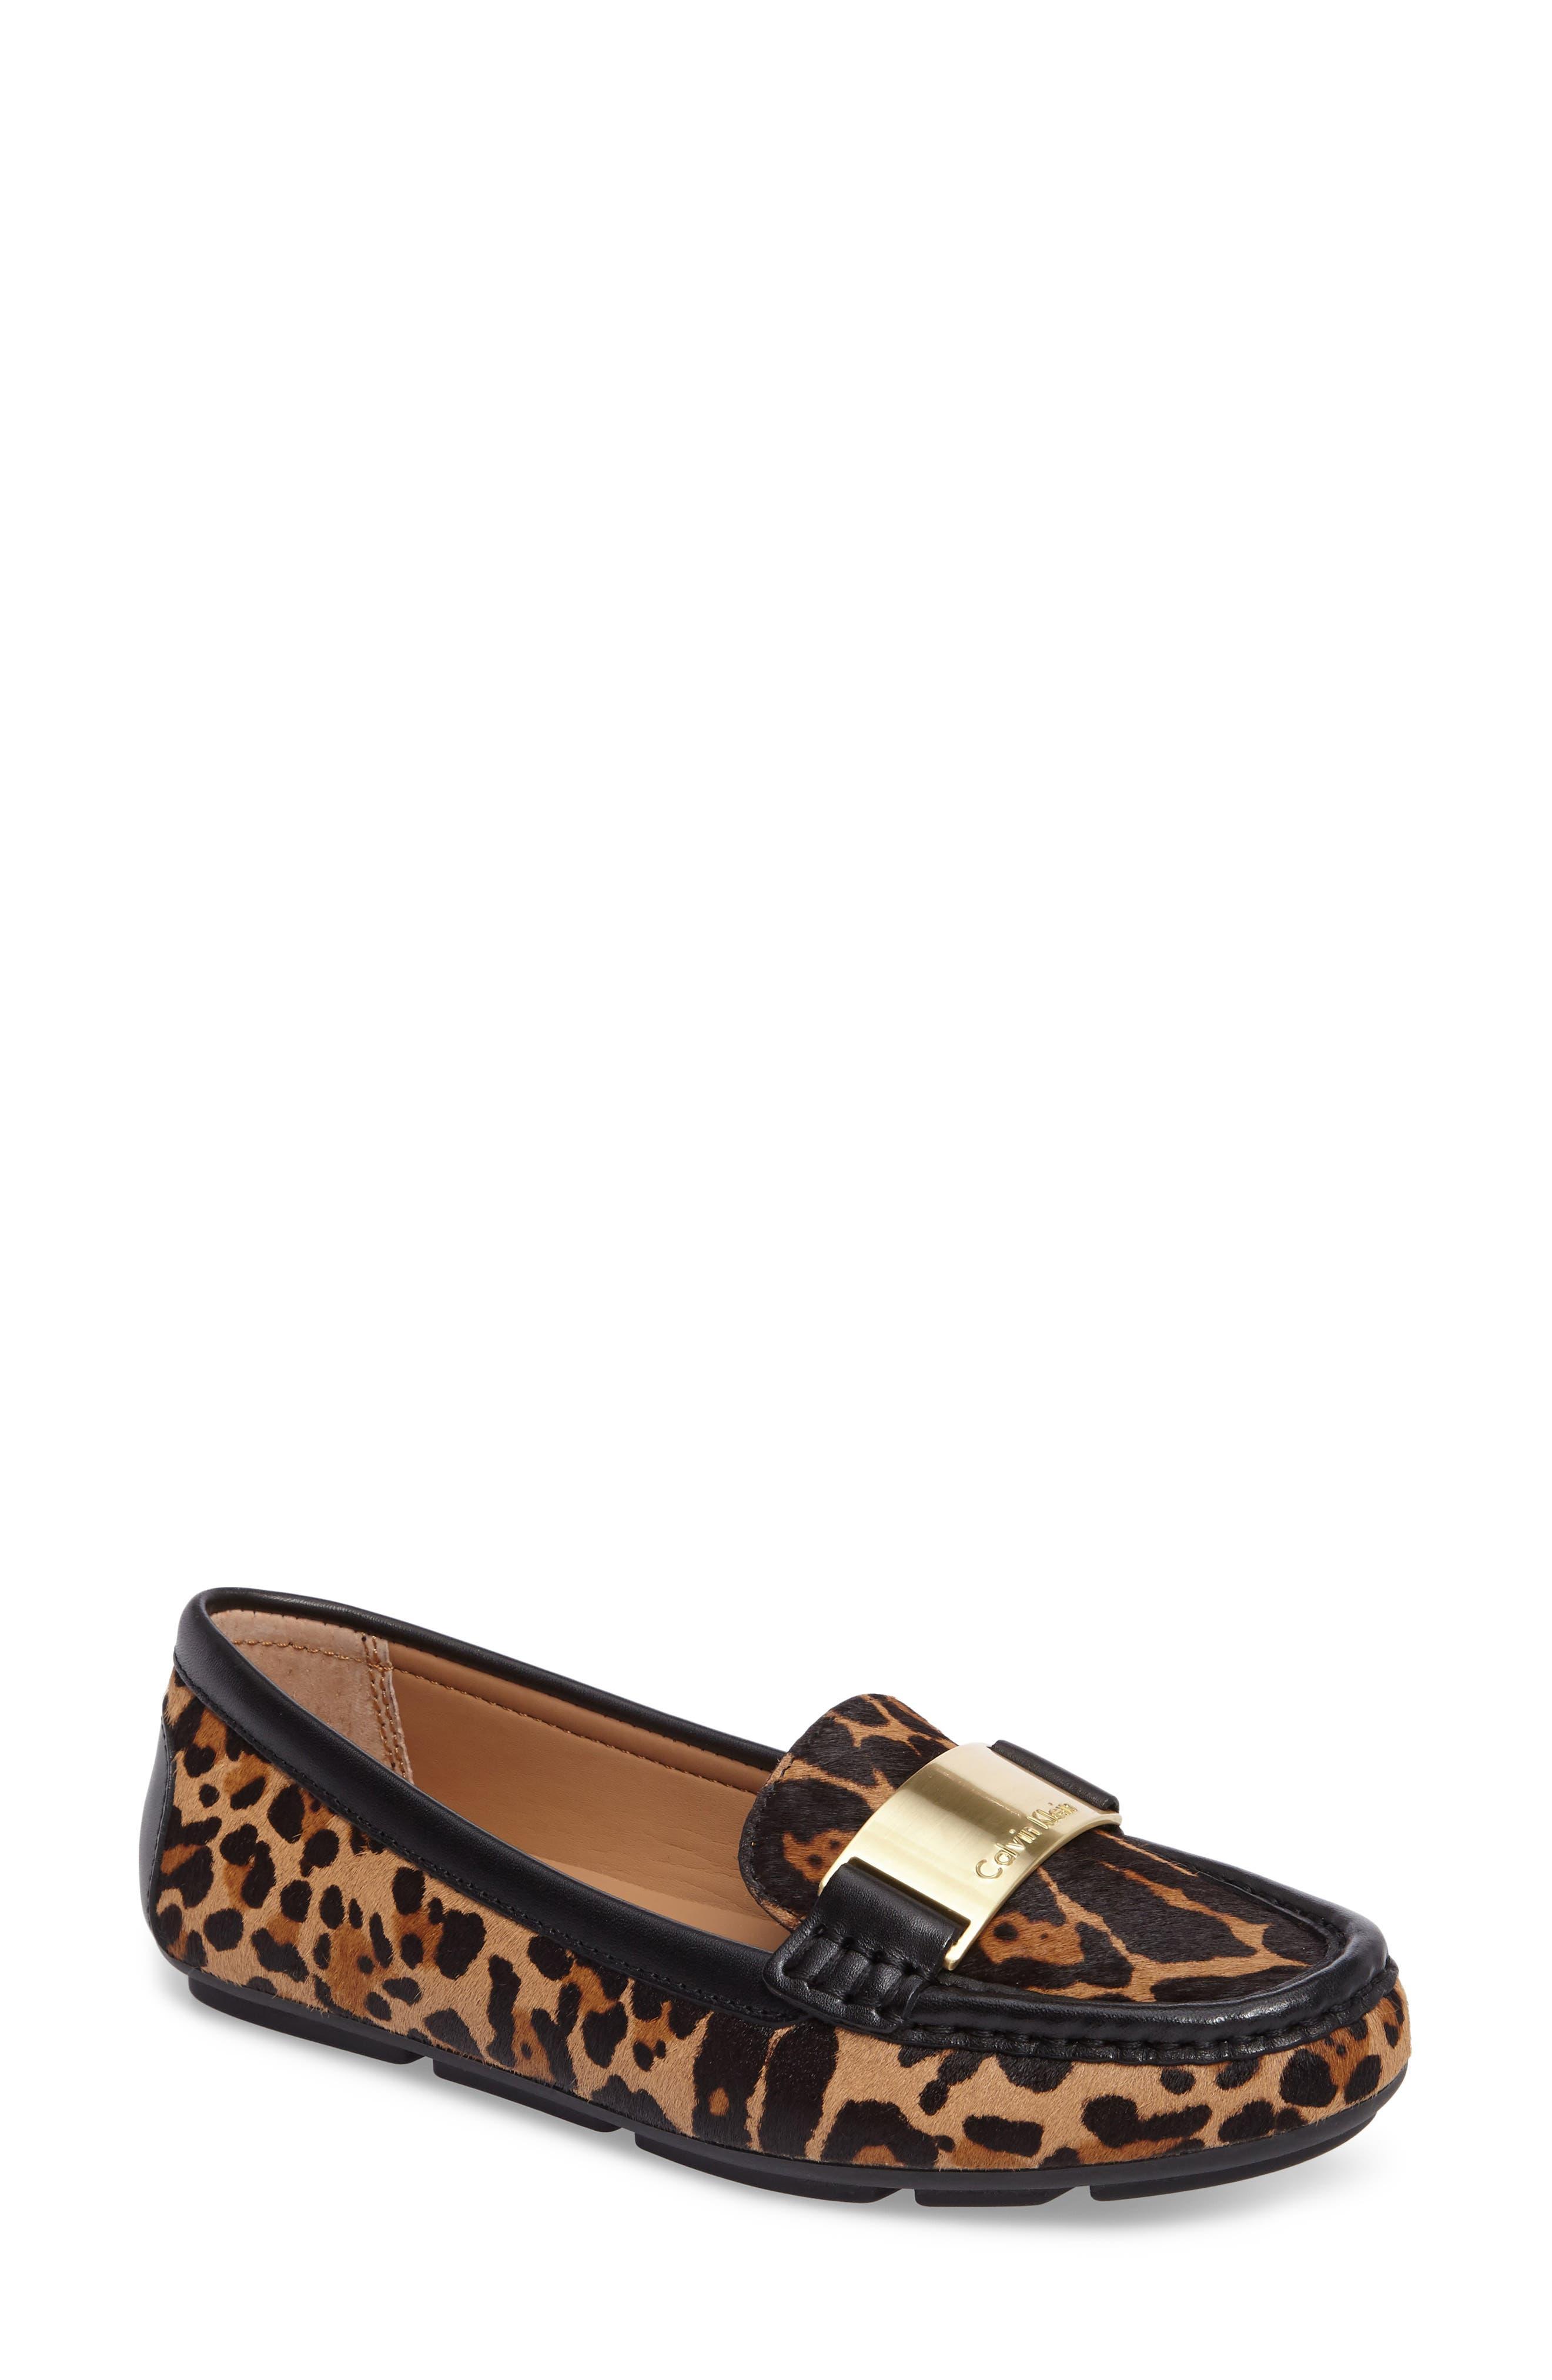 Lisette Loafer,                         Main,                         color, Natural Leopard Hair Calf